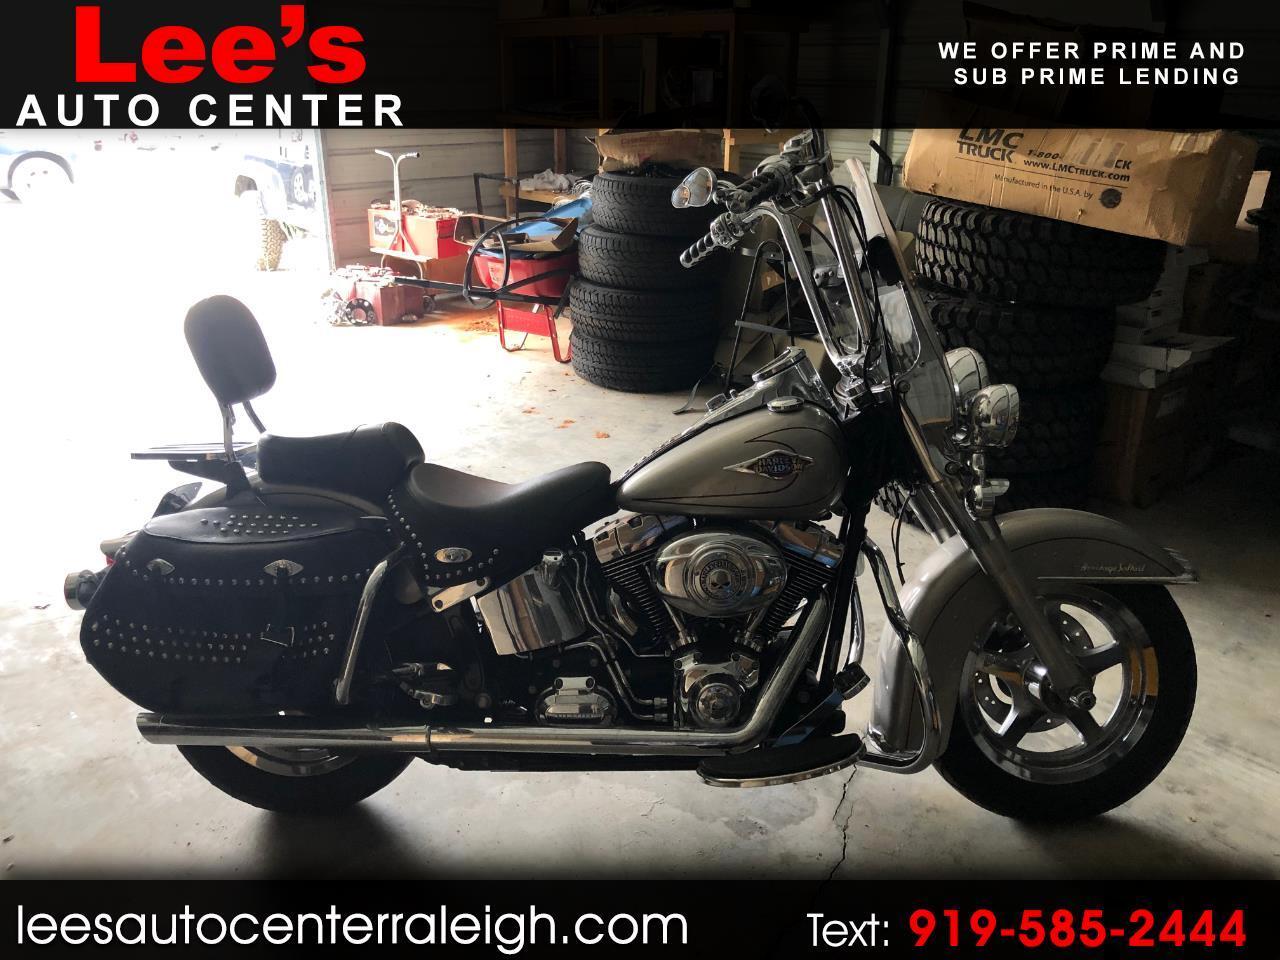 2009 Harley-Davidson Heritage Softail